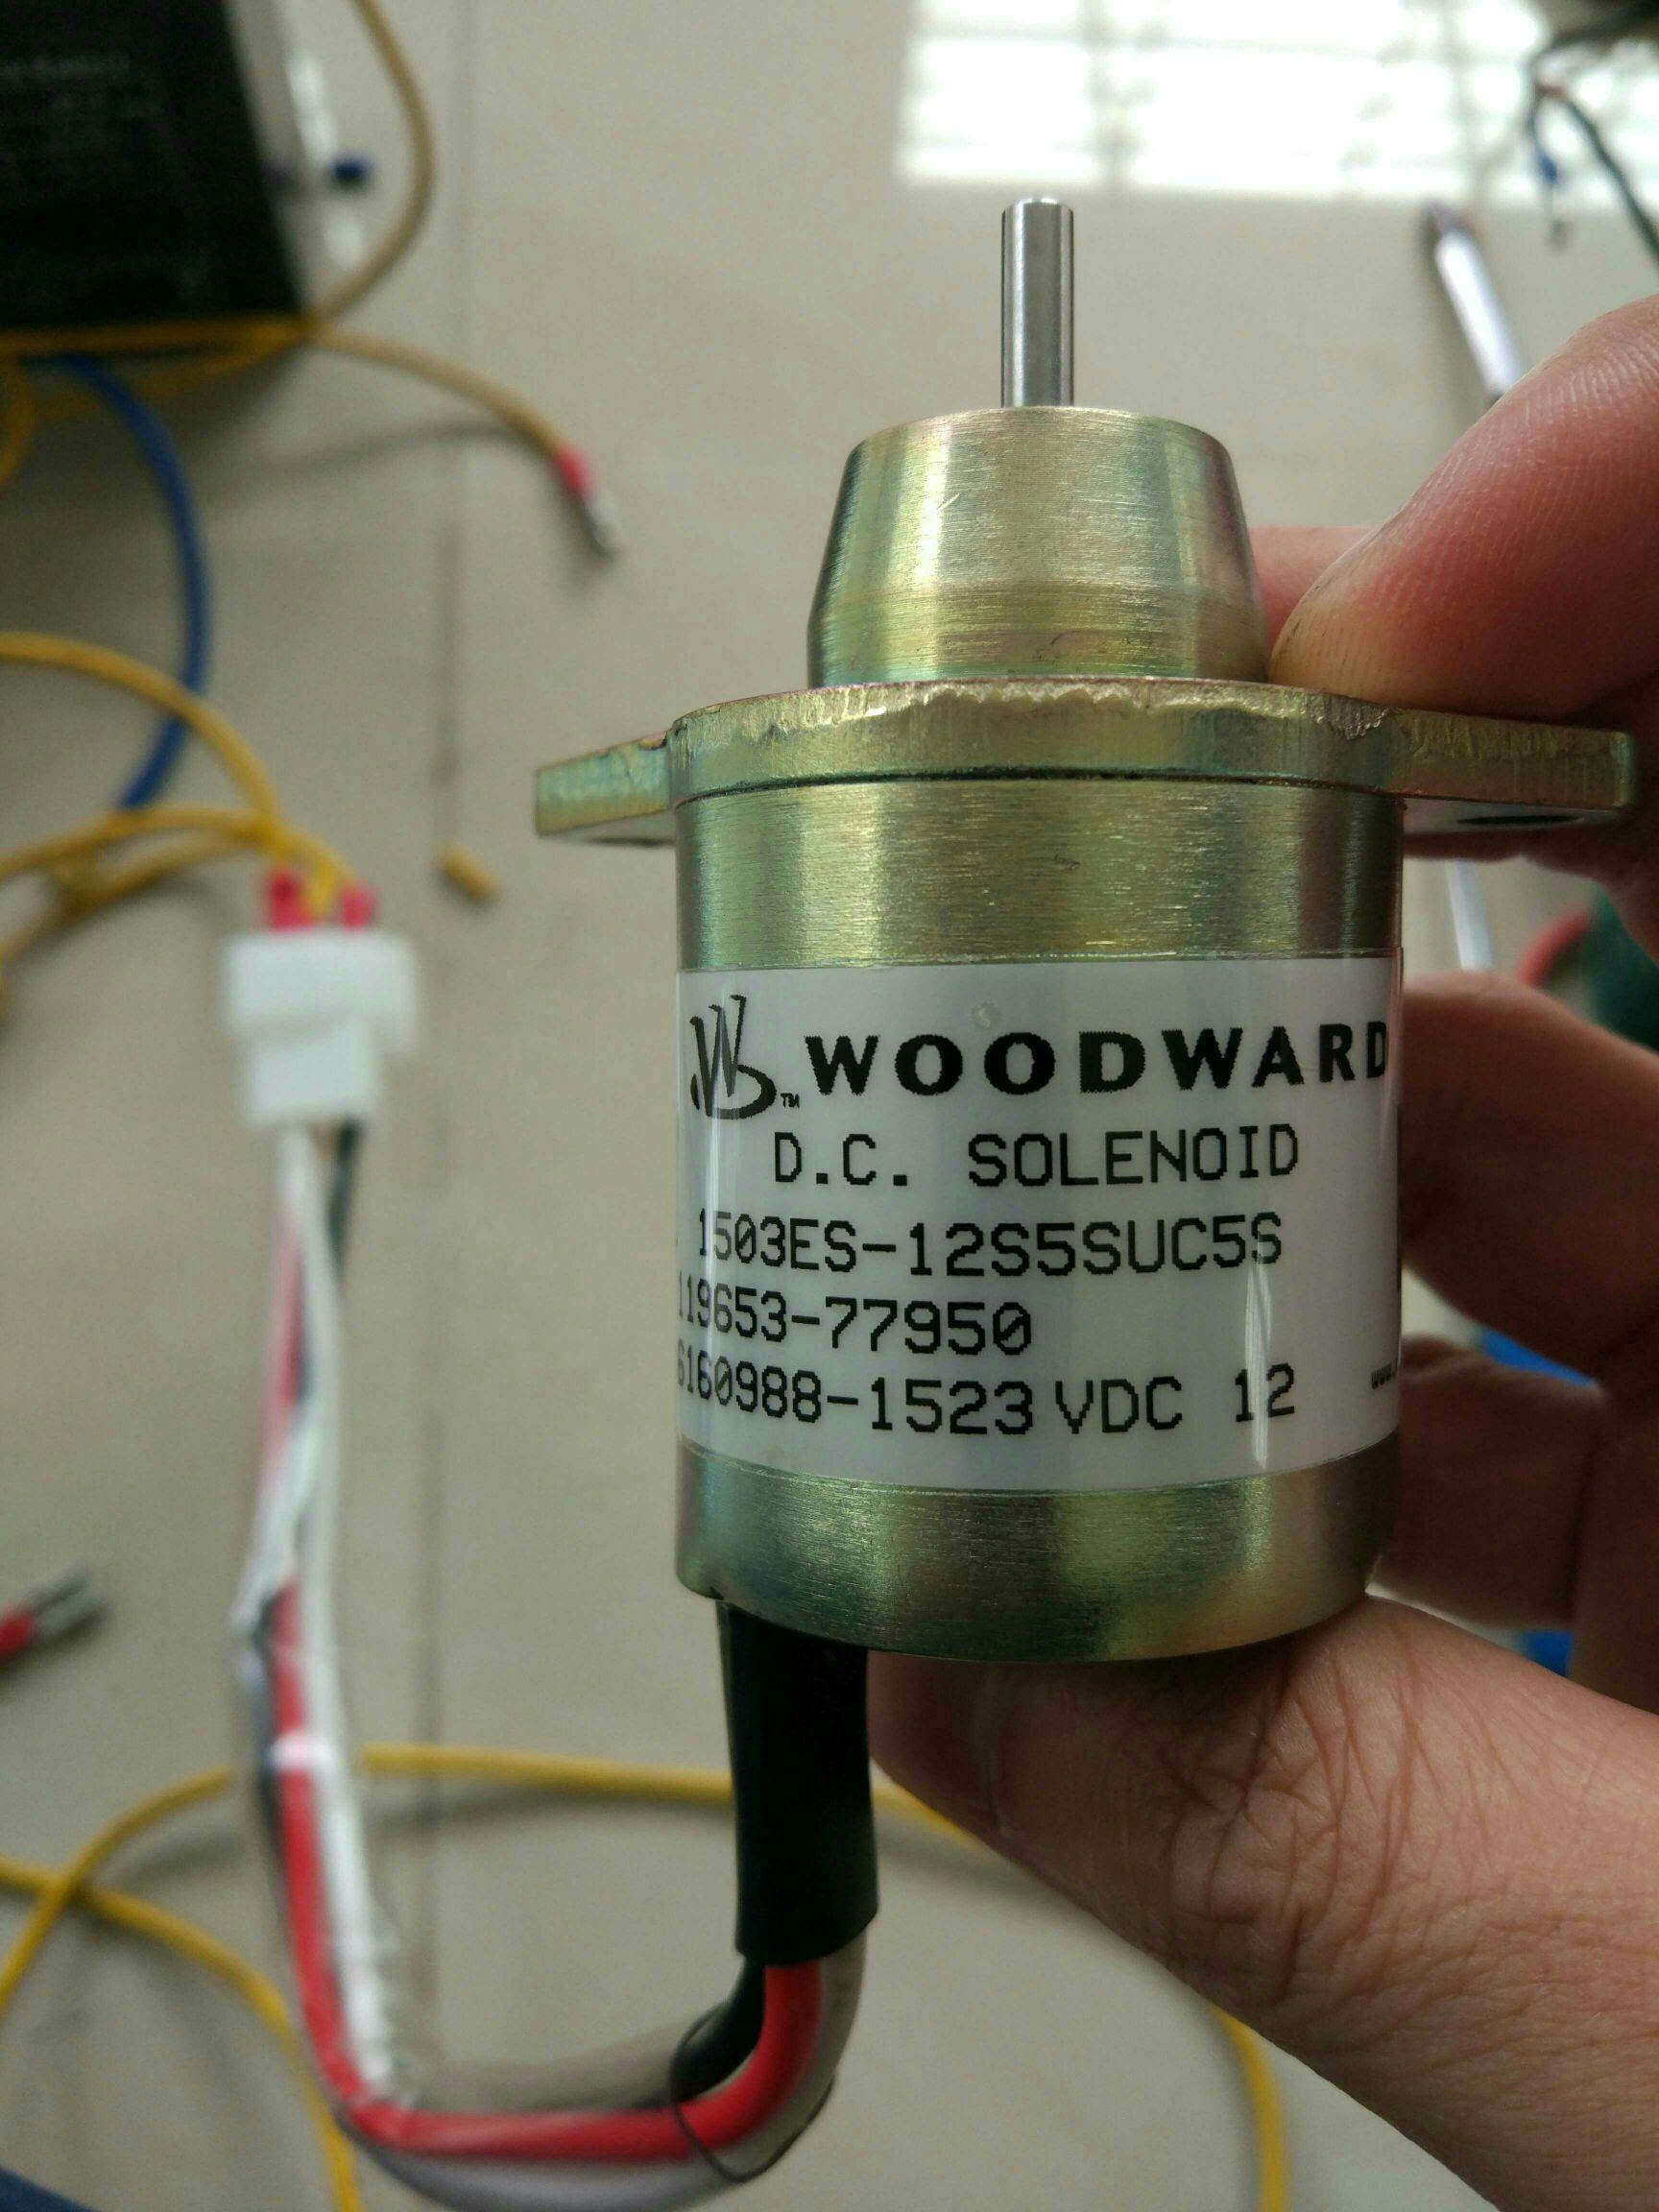 Fuel Stop Solenoid Wiring Diagram - Wiring Diagram   Woodward Solenoid Wiring Diagram      Wiring Diagram